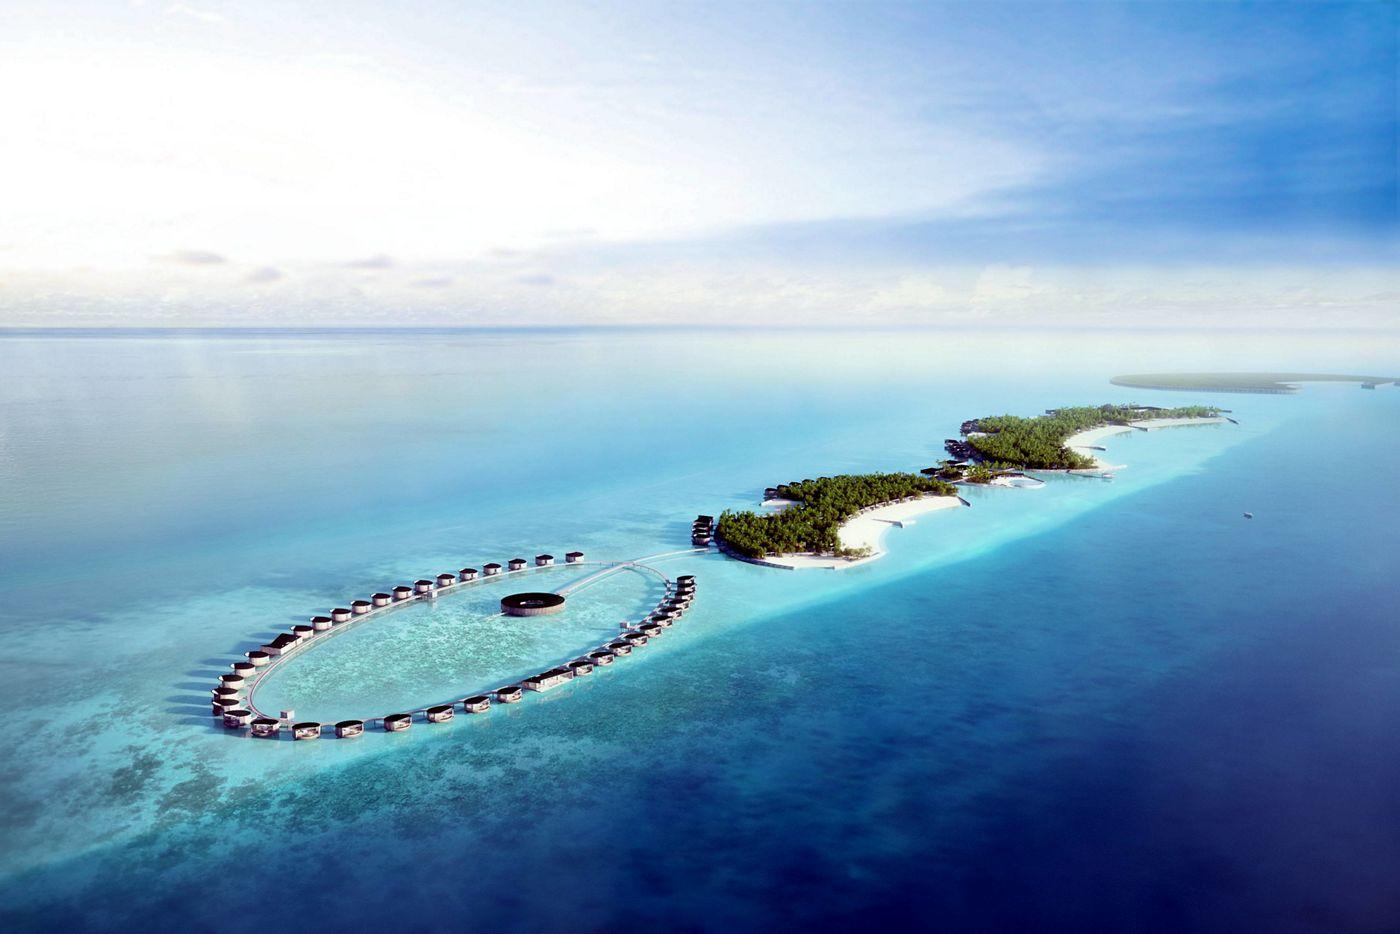 the ritz-carlton maldives jobs,,the ritz-carlton maldives, fari islands,,ritz-carlton maldives vacancy,,ritz-carlton maldives fari islands jobs,,ritz-carlton maldives job vacancy,,fari islands, maldives,,the ritz-carlton maldives opening date,,ritz-carlton maldives job vacancies